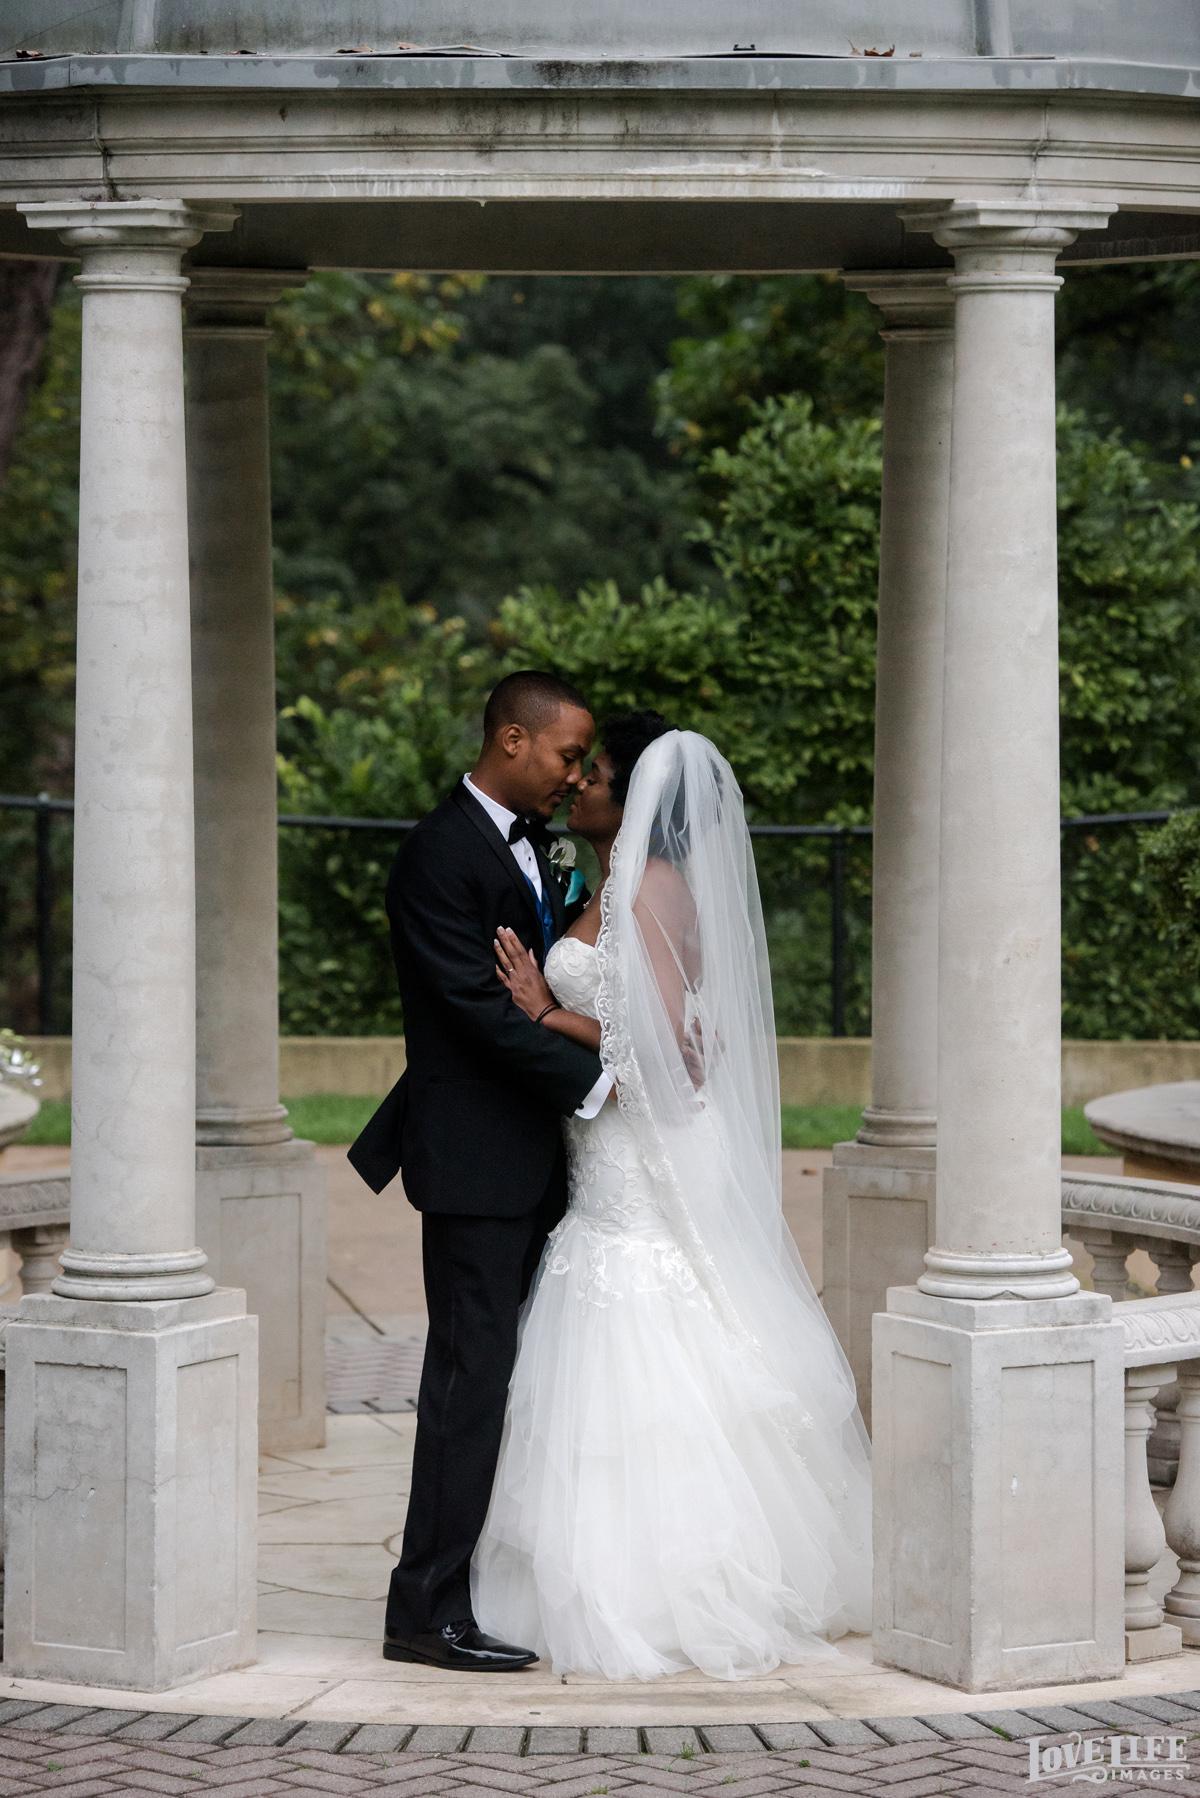 Omni Shoreham DC Wedding couple portrait in gazebo.jpg